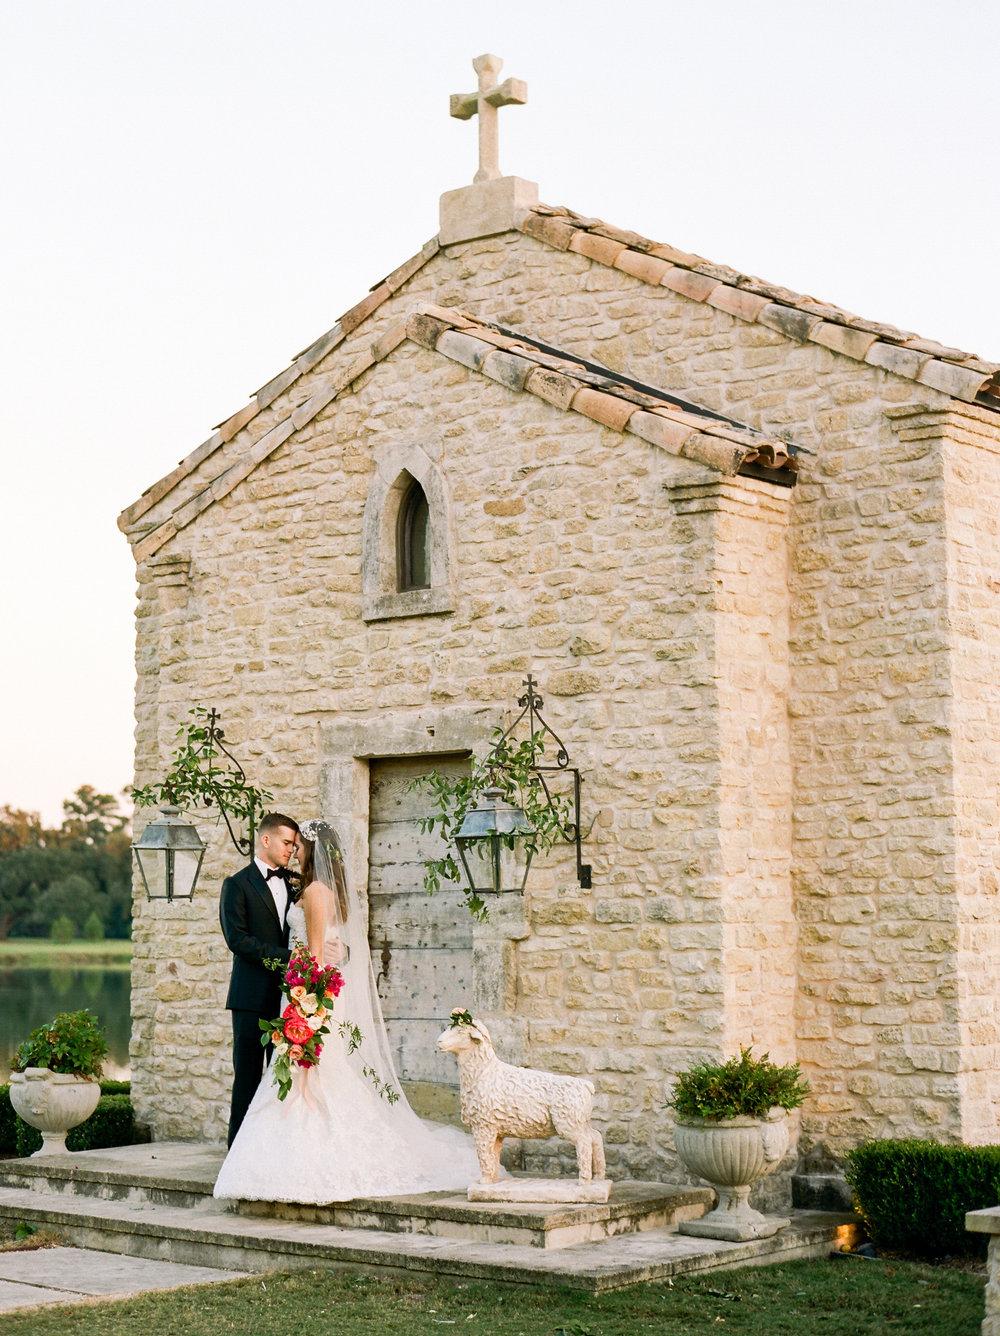 Top-Houston-Wedding-Photographer-Dana-Fernandez-Photography-The-Clubs-At-Houston-Oaks-Country-Club-Belle-Events-Film-Fine-Art-Destination-8.jpg